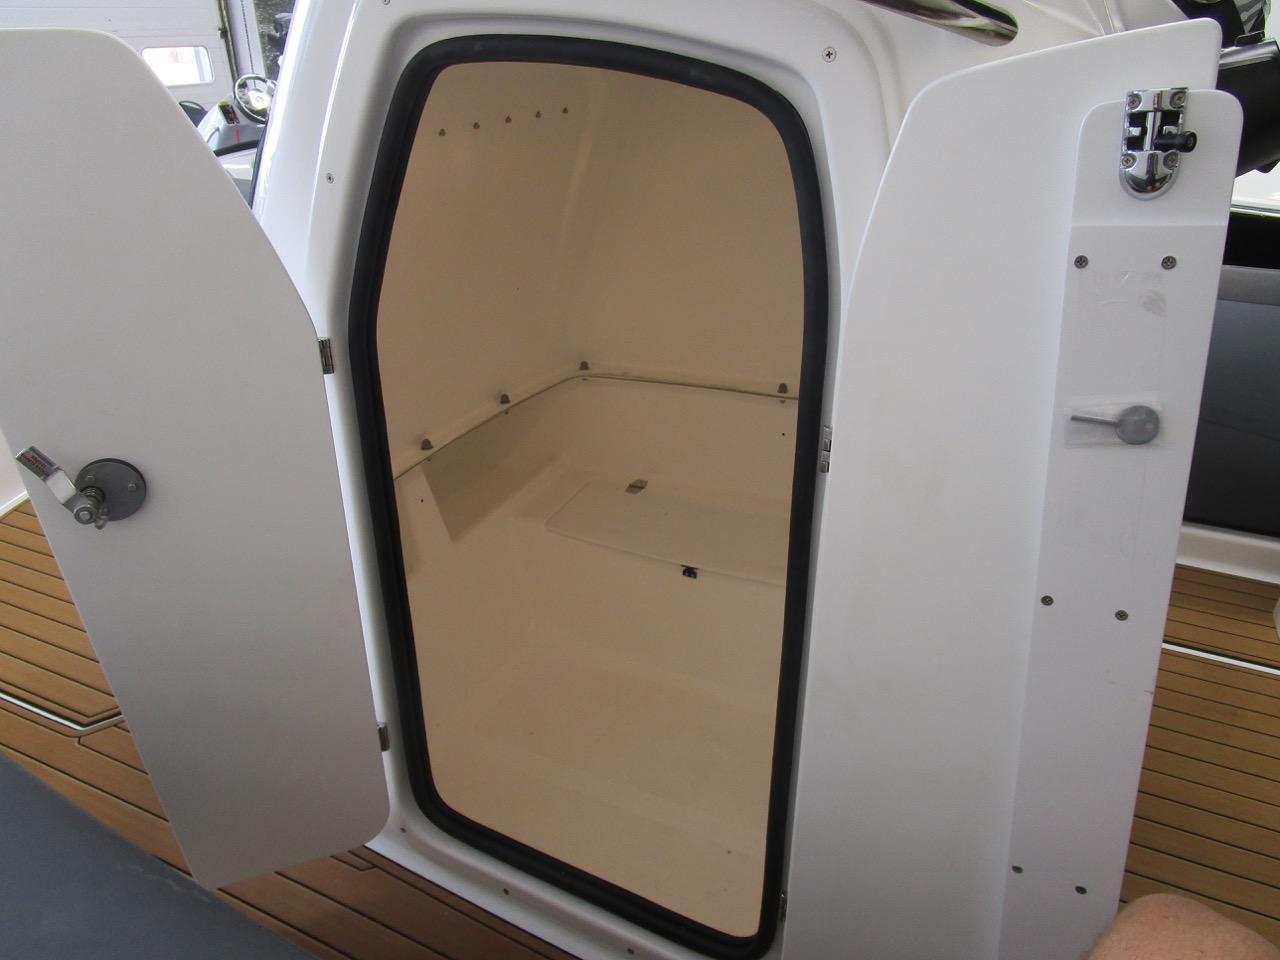 E780 console cabin doors open, lights on